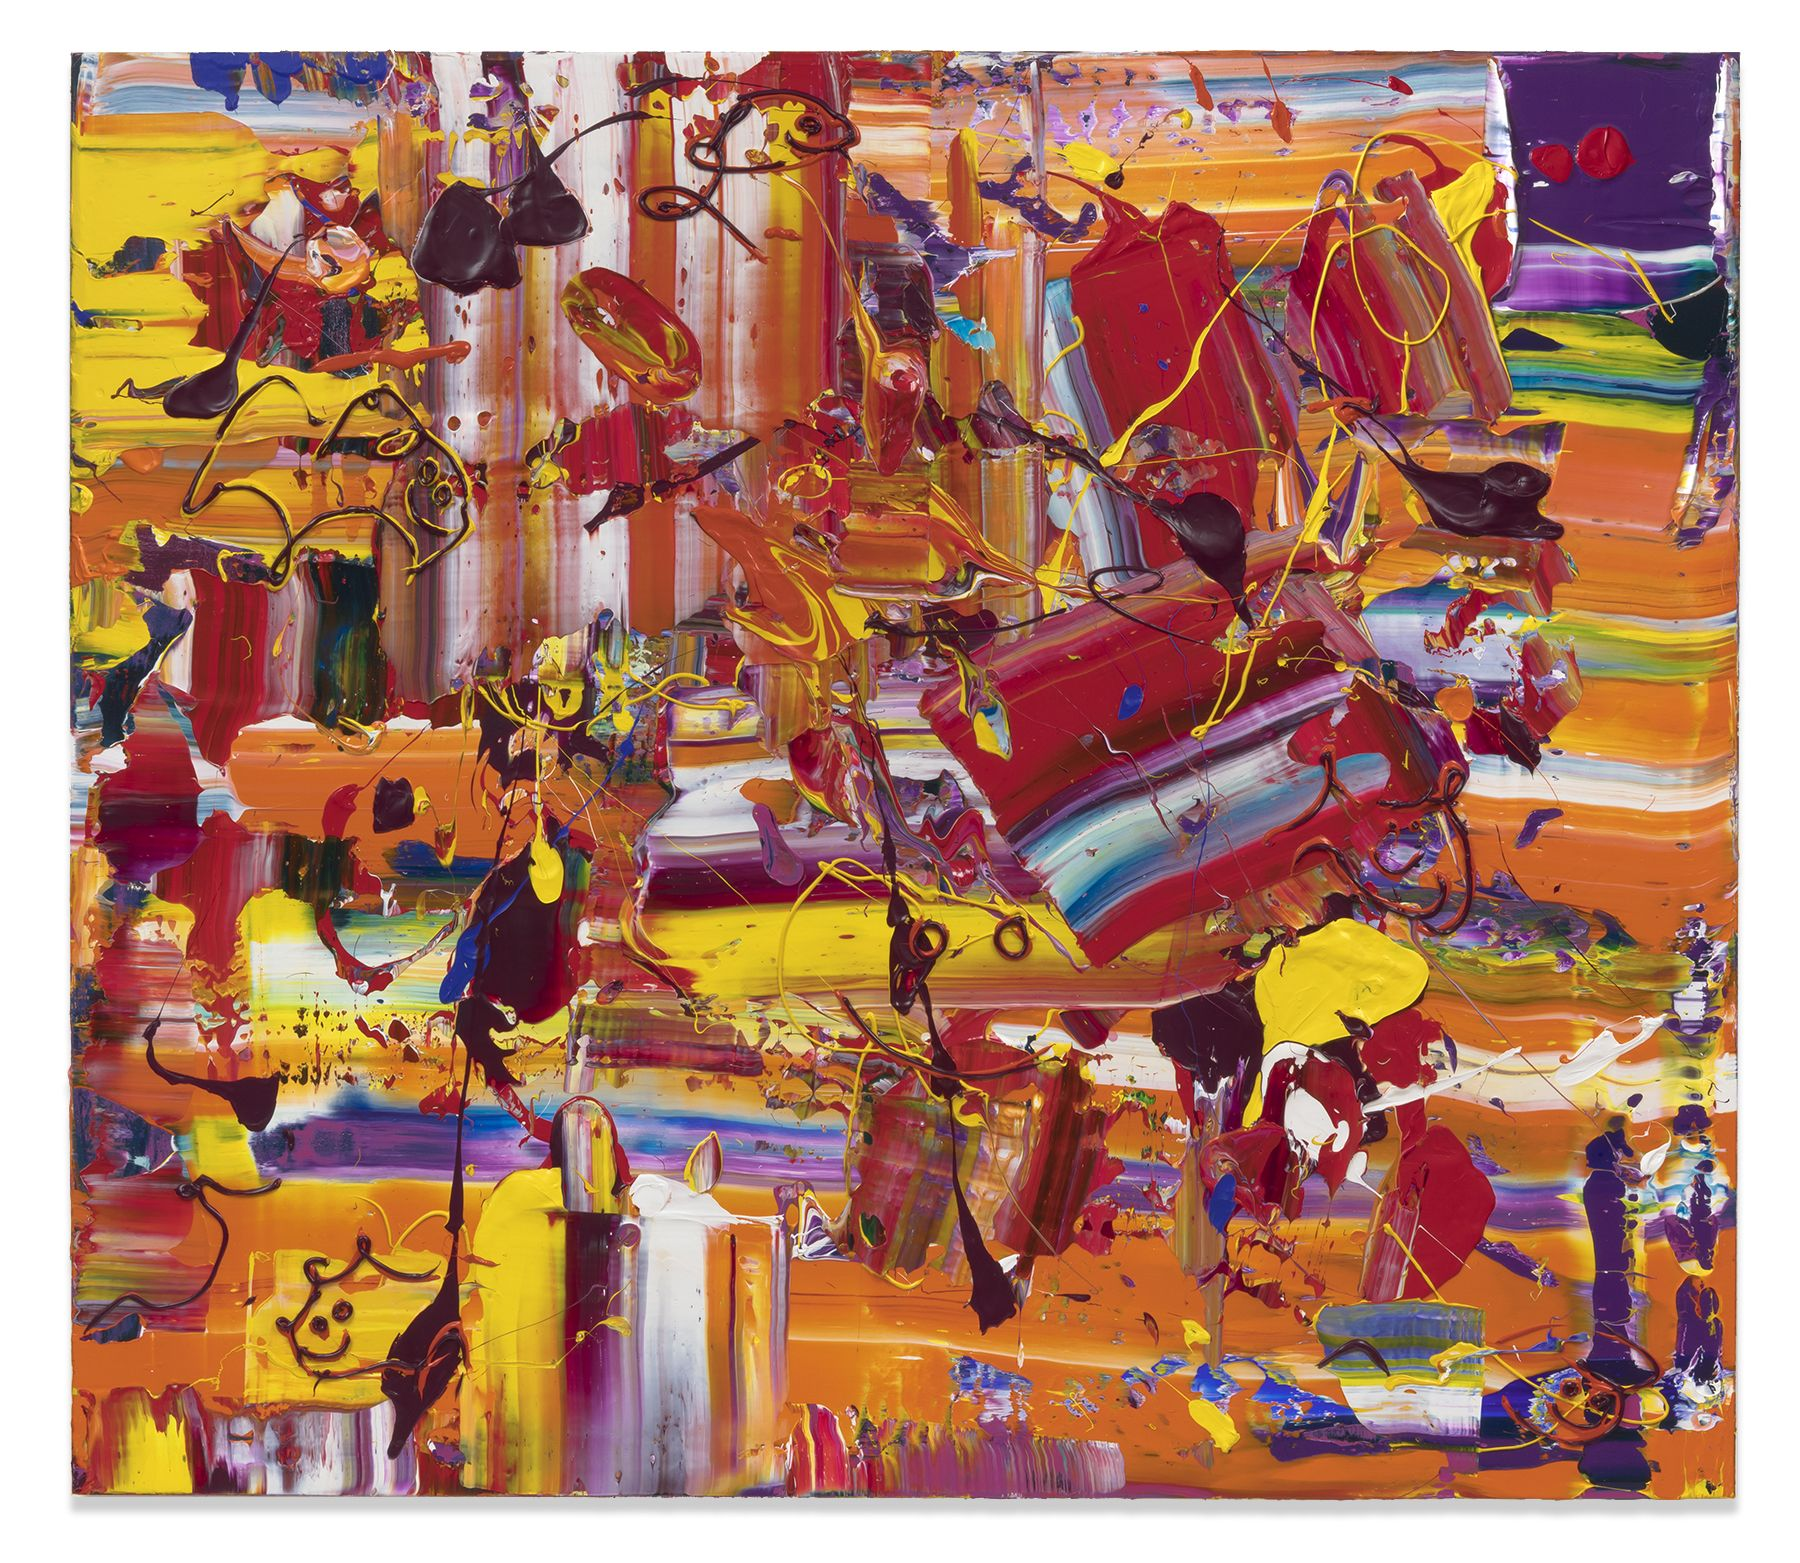 Michael Reafsnyder, Orange Slurp, 2018, Acrylic on linen